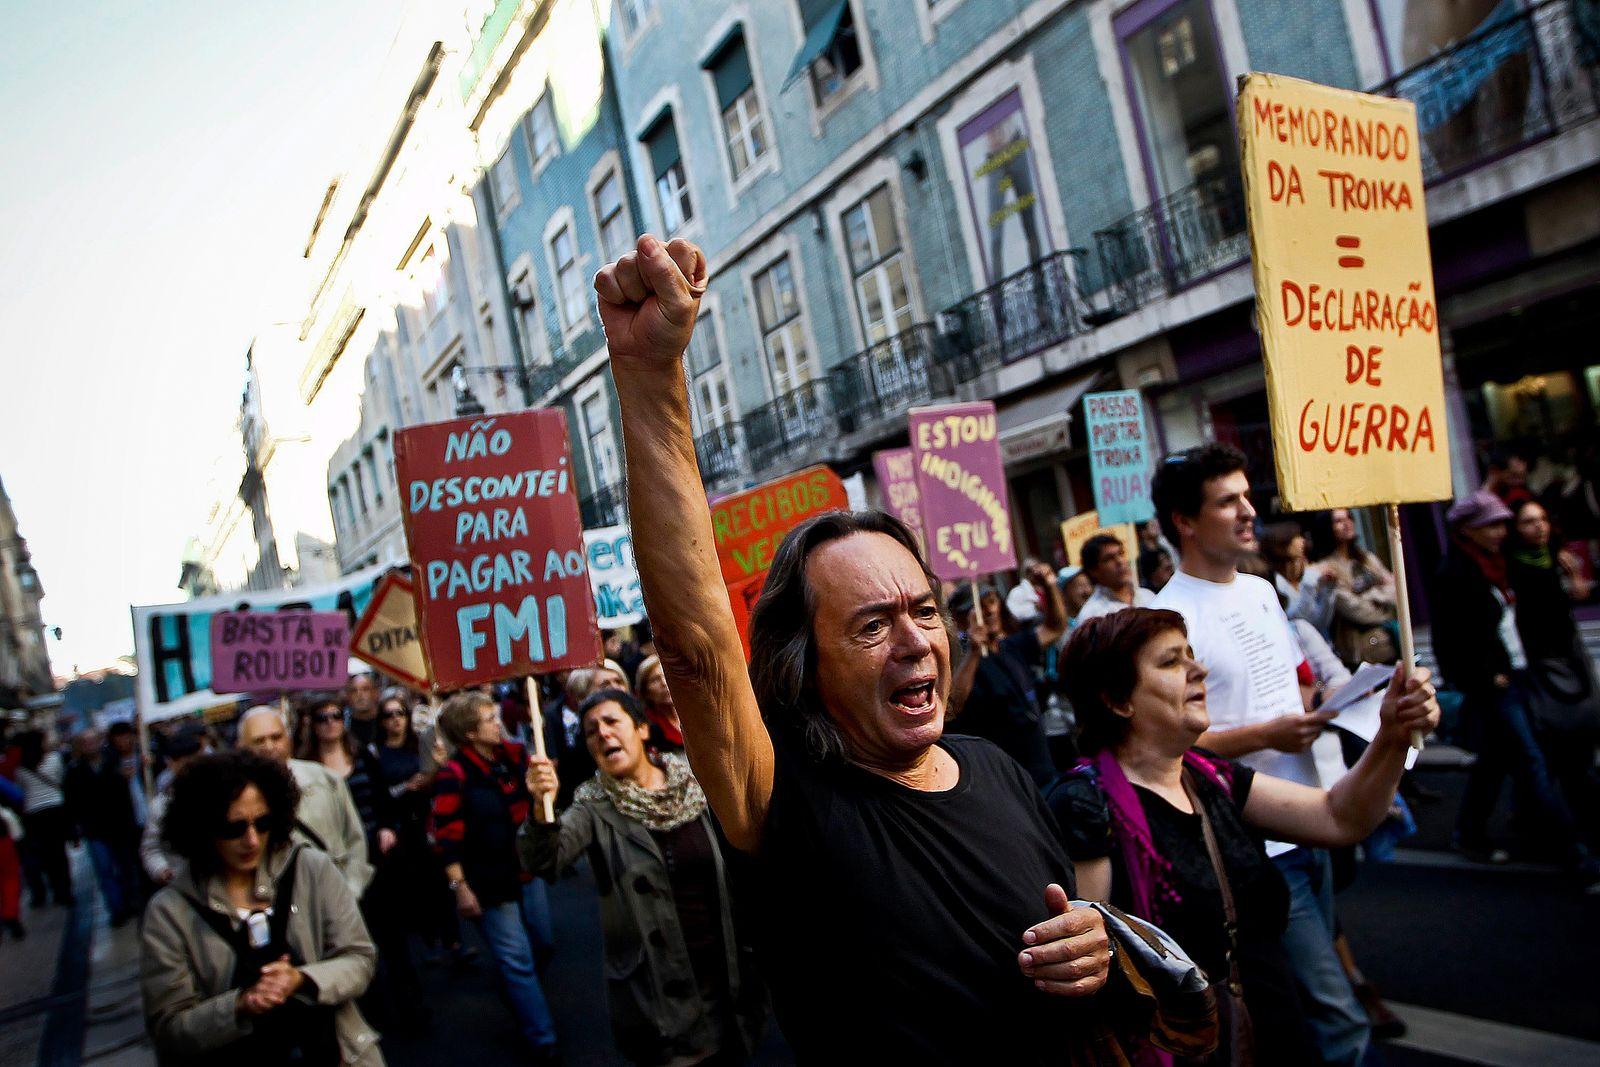 Portugal / Protest gegen Troika